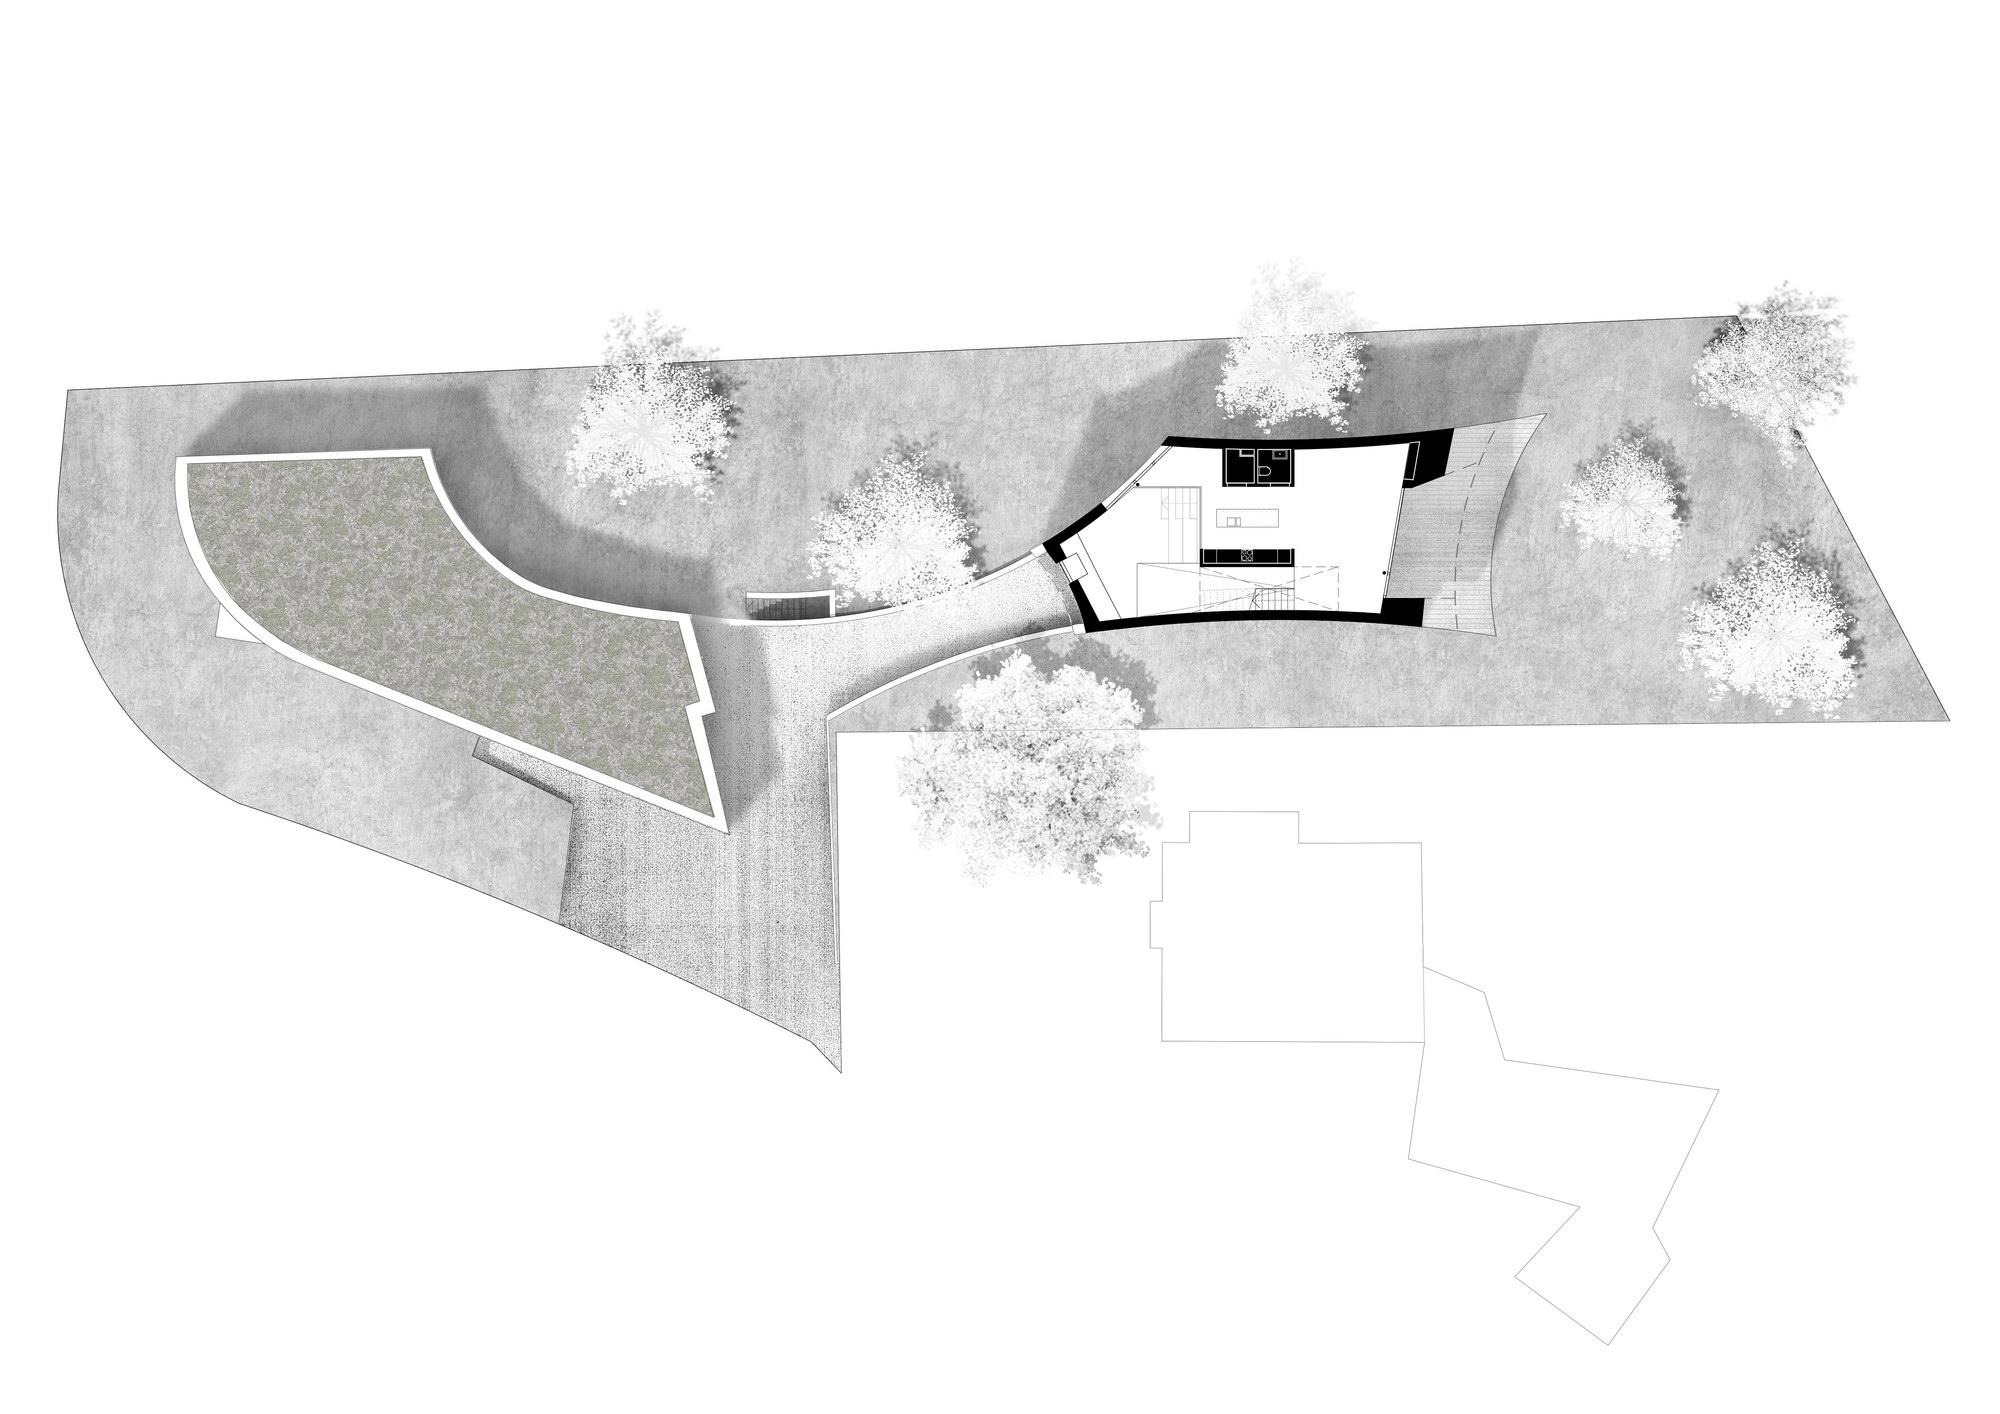 Casa Curved by Daluz Gonzalez Architekten